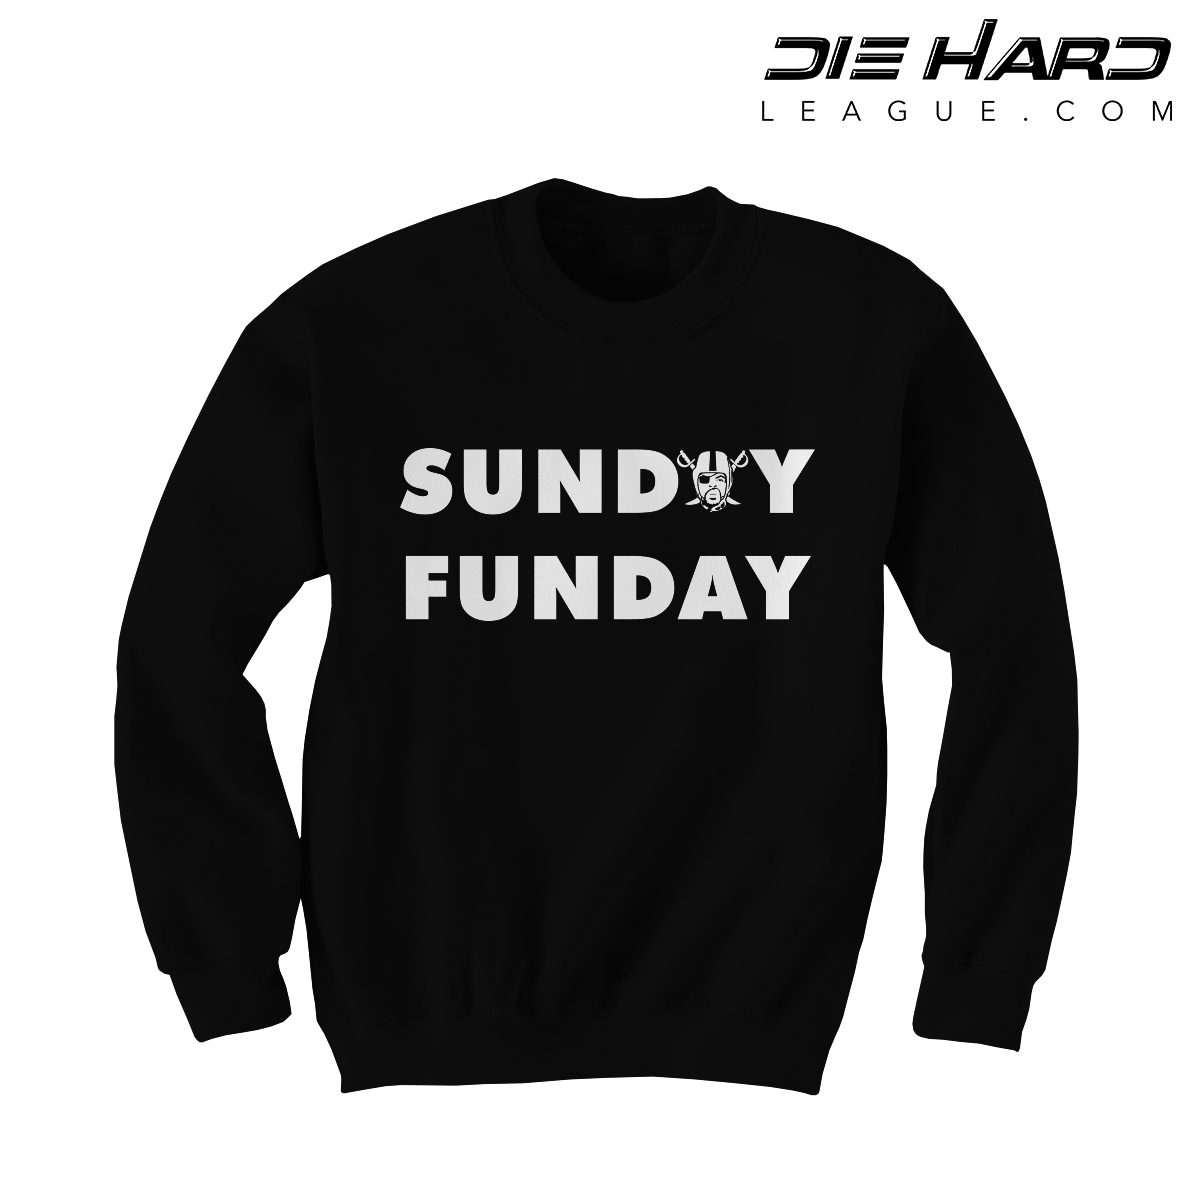 7ddd1445a70 Shop. Home Oakland Raiders Clothing Raiders Sweatshirts Oakland Raiders  Sweatshirts – Sunday Funday Black Crewneck